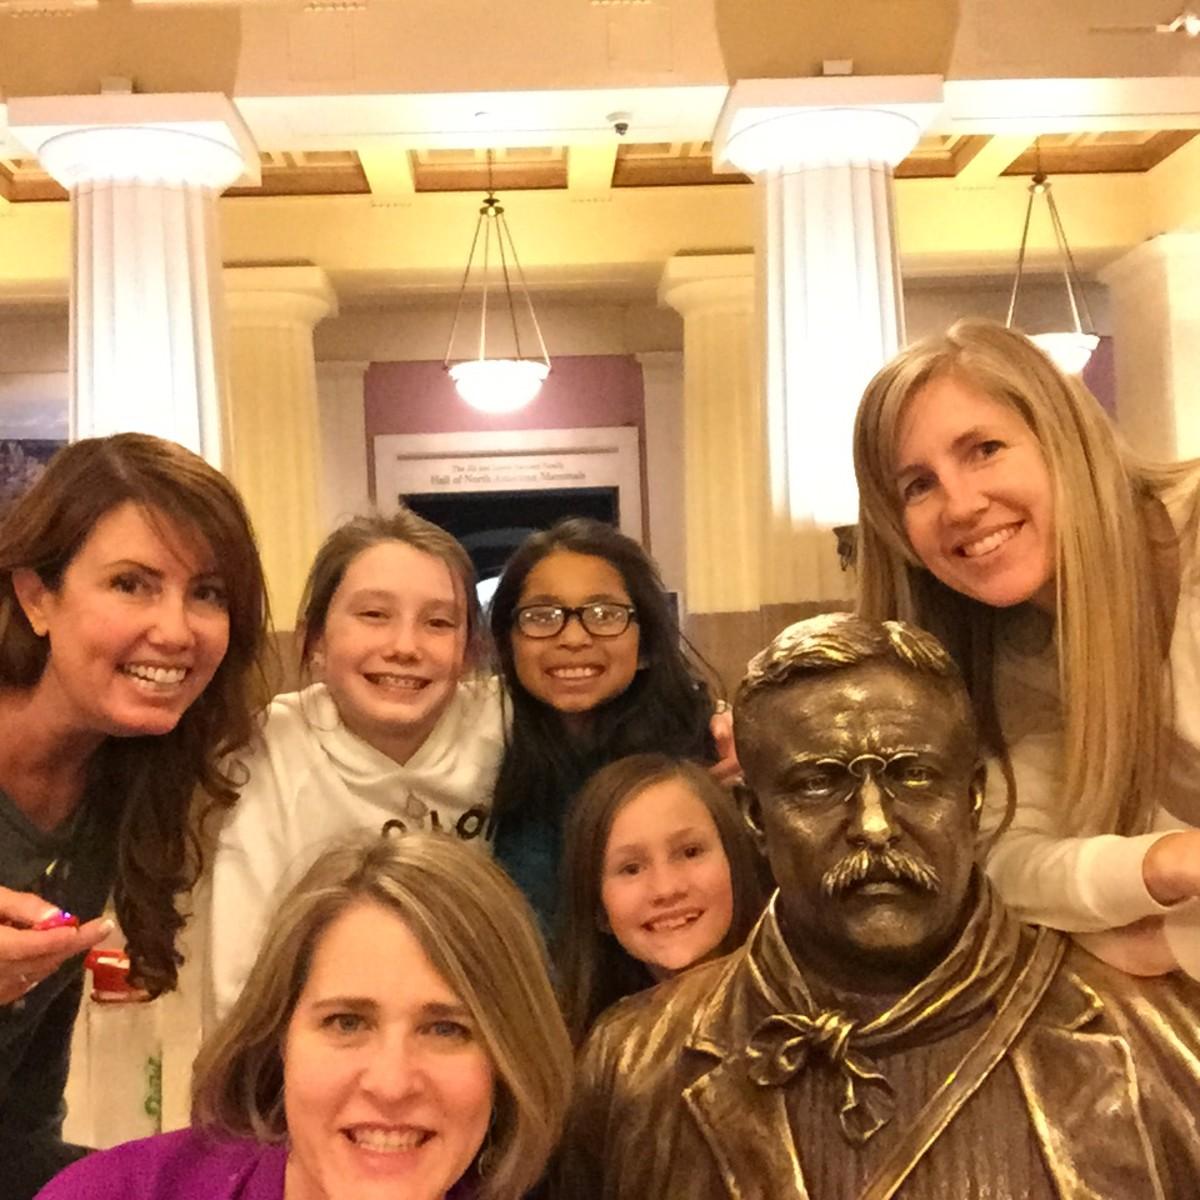 Selfie Stick and Teddy Roosevelt